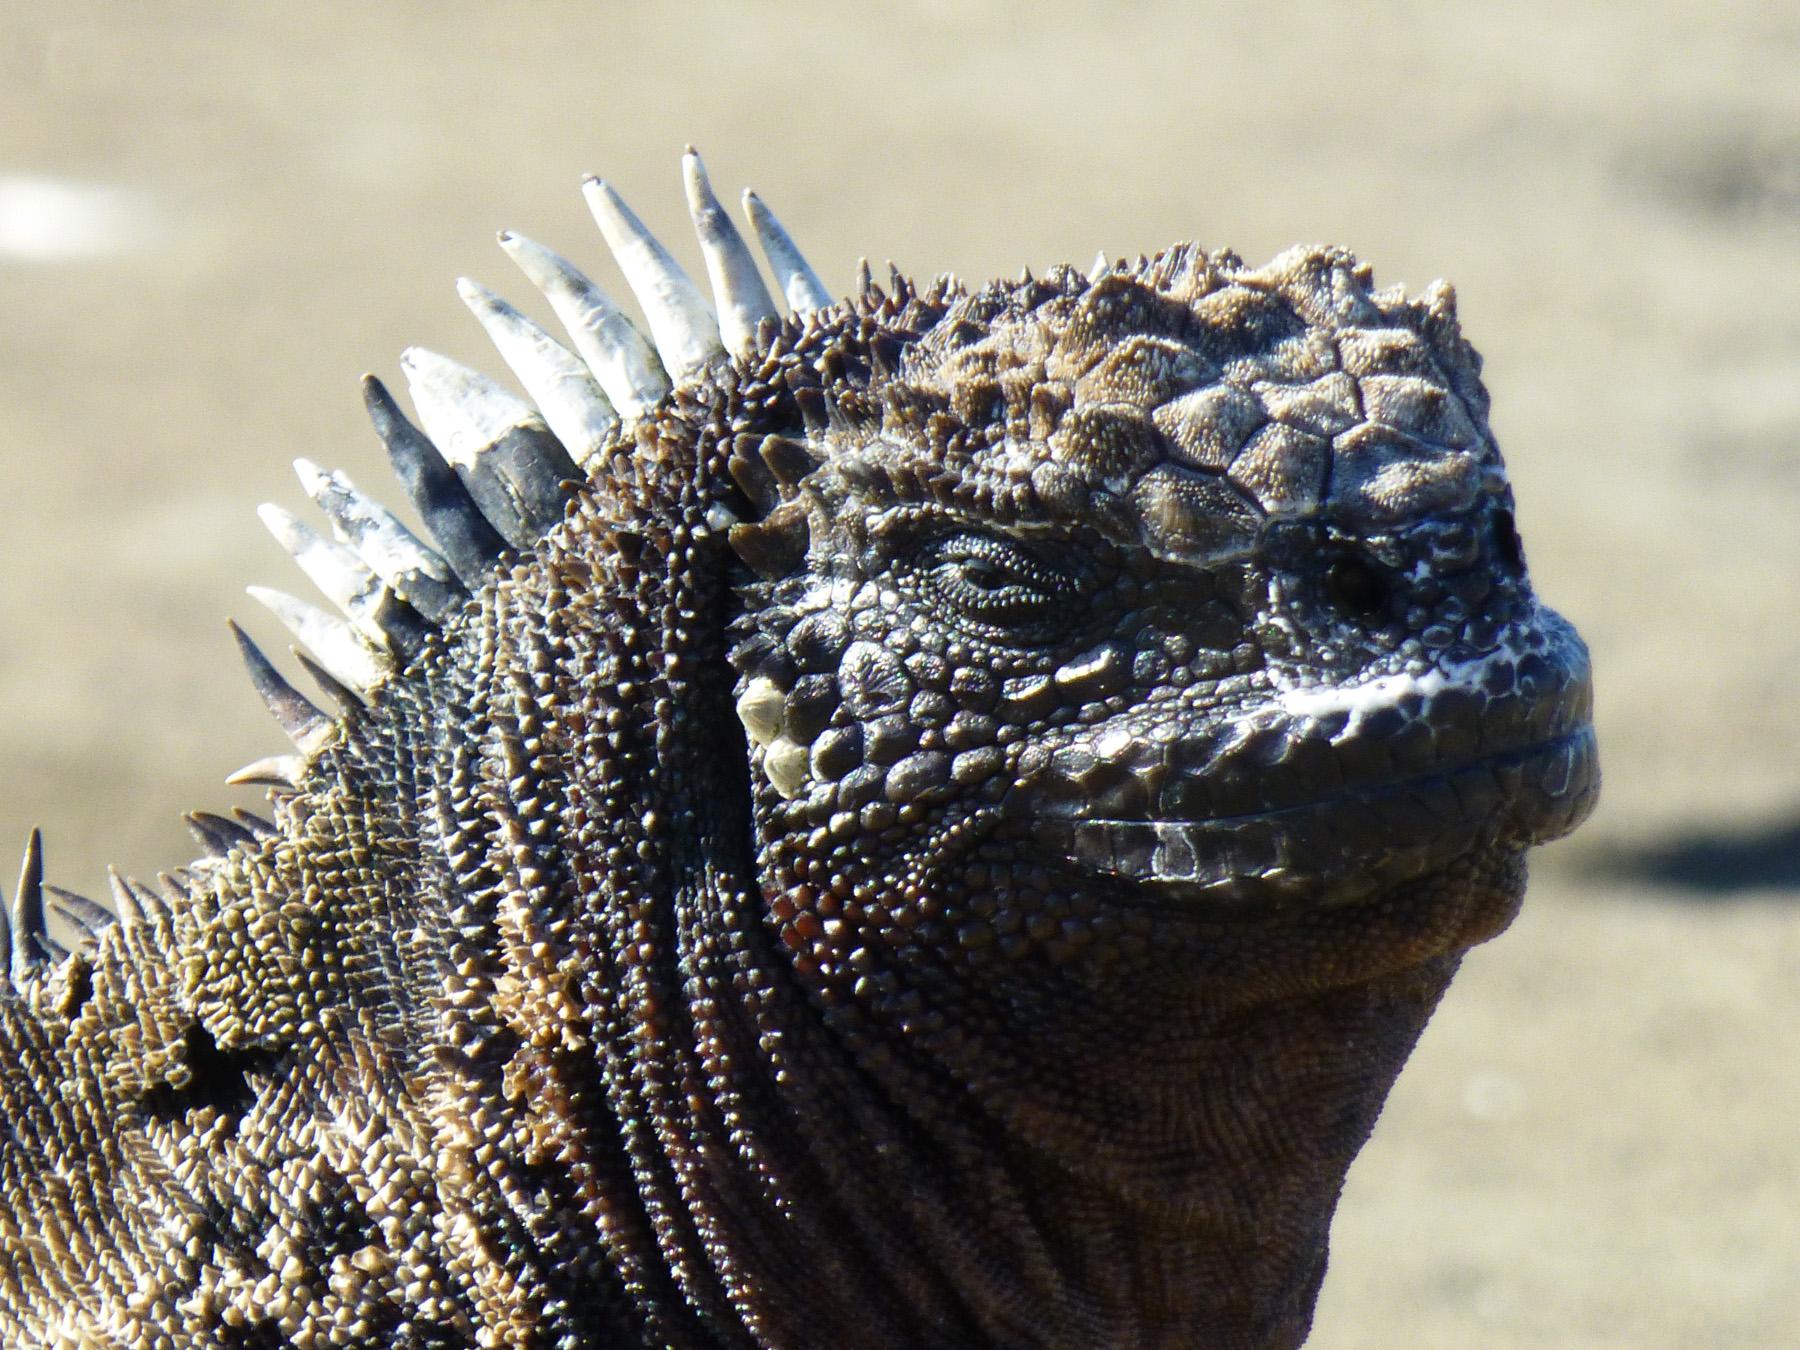 A marine iguana giving some attitude.